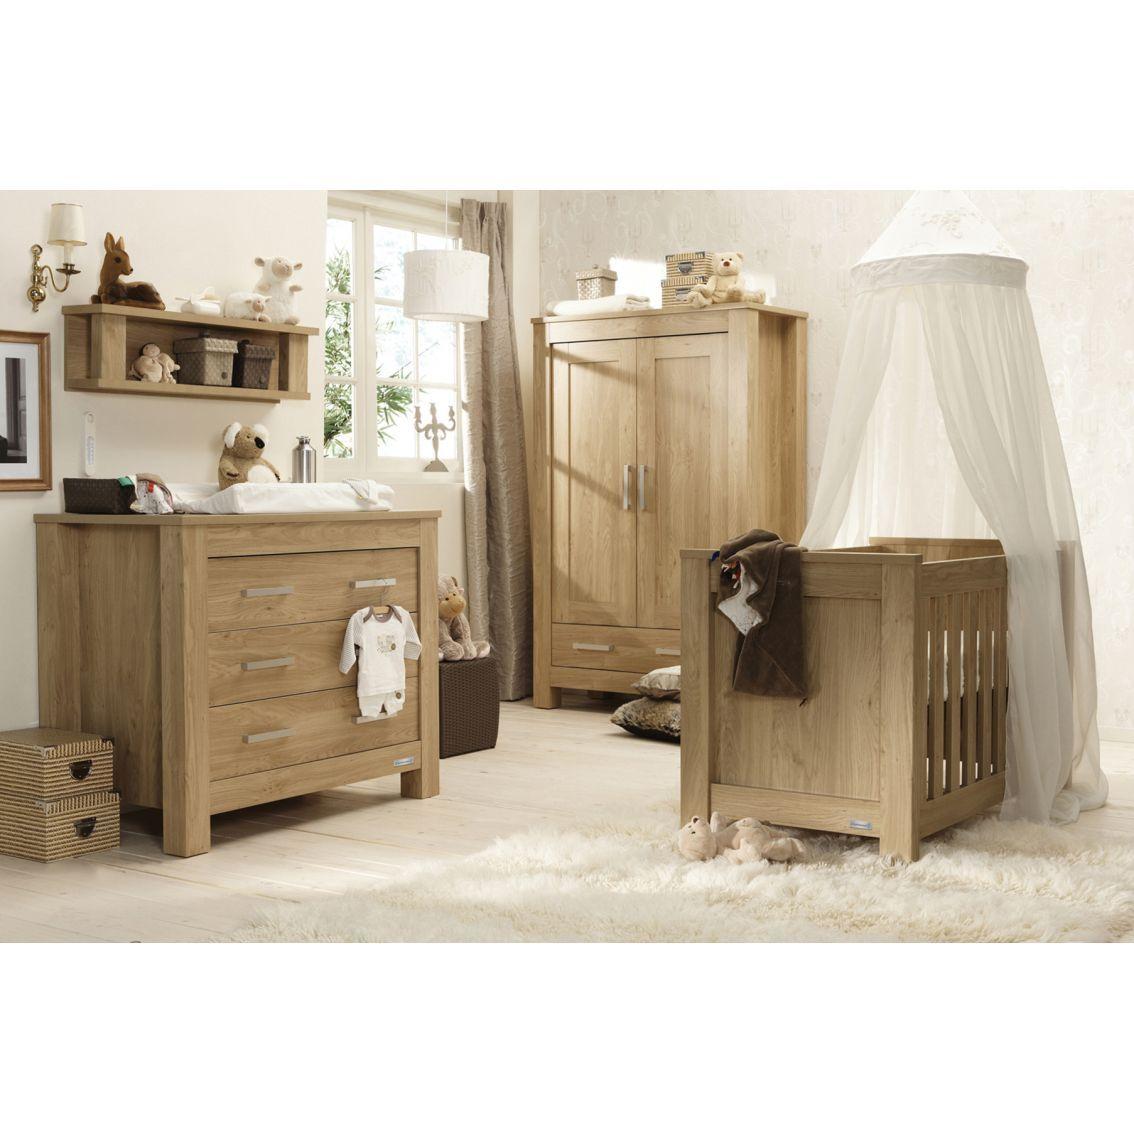 Furniture Nursery Sets Babystyle Bordeaux Set